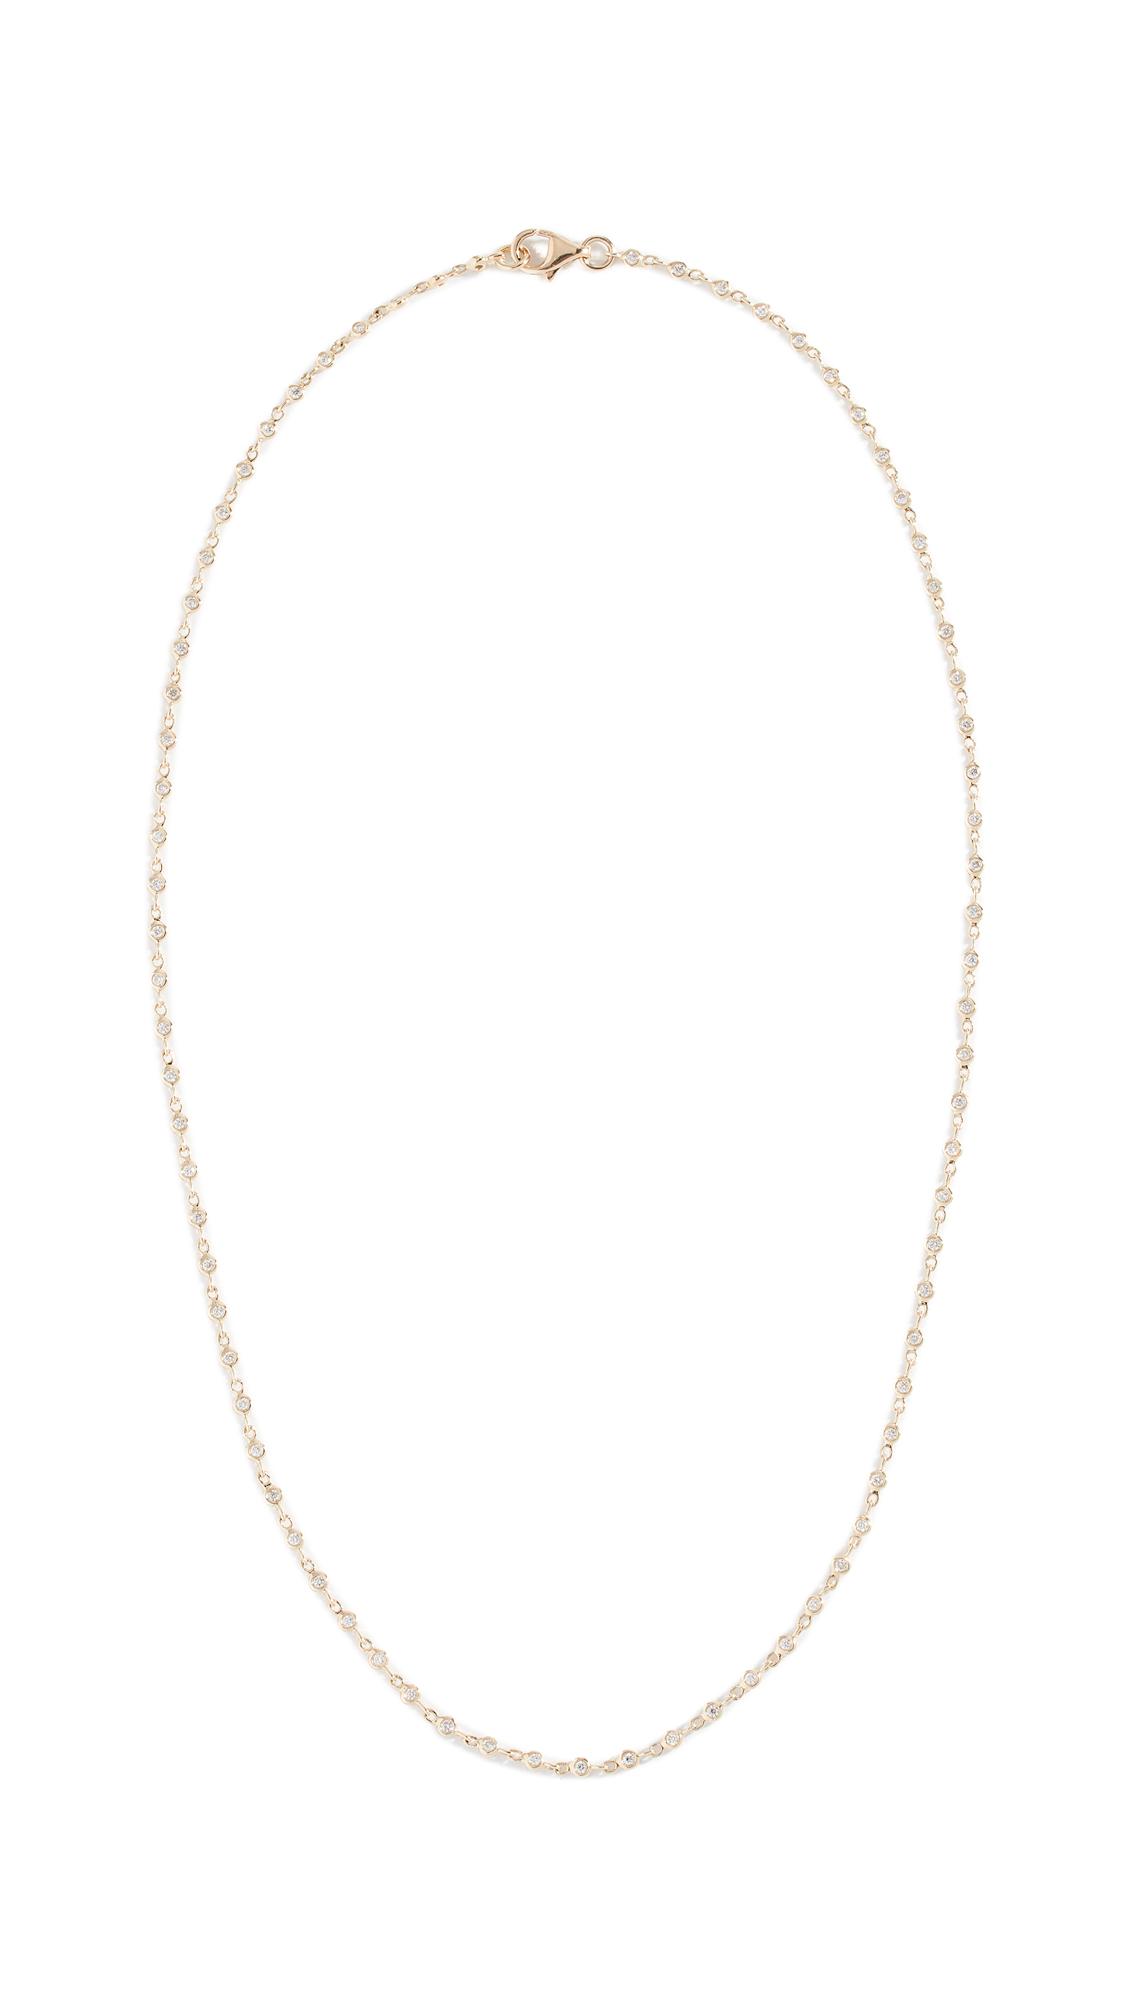 ARIEL GORDON JEWELRY 14K Diamond Ember Necklace in Yellow Gold